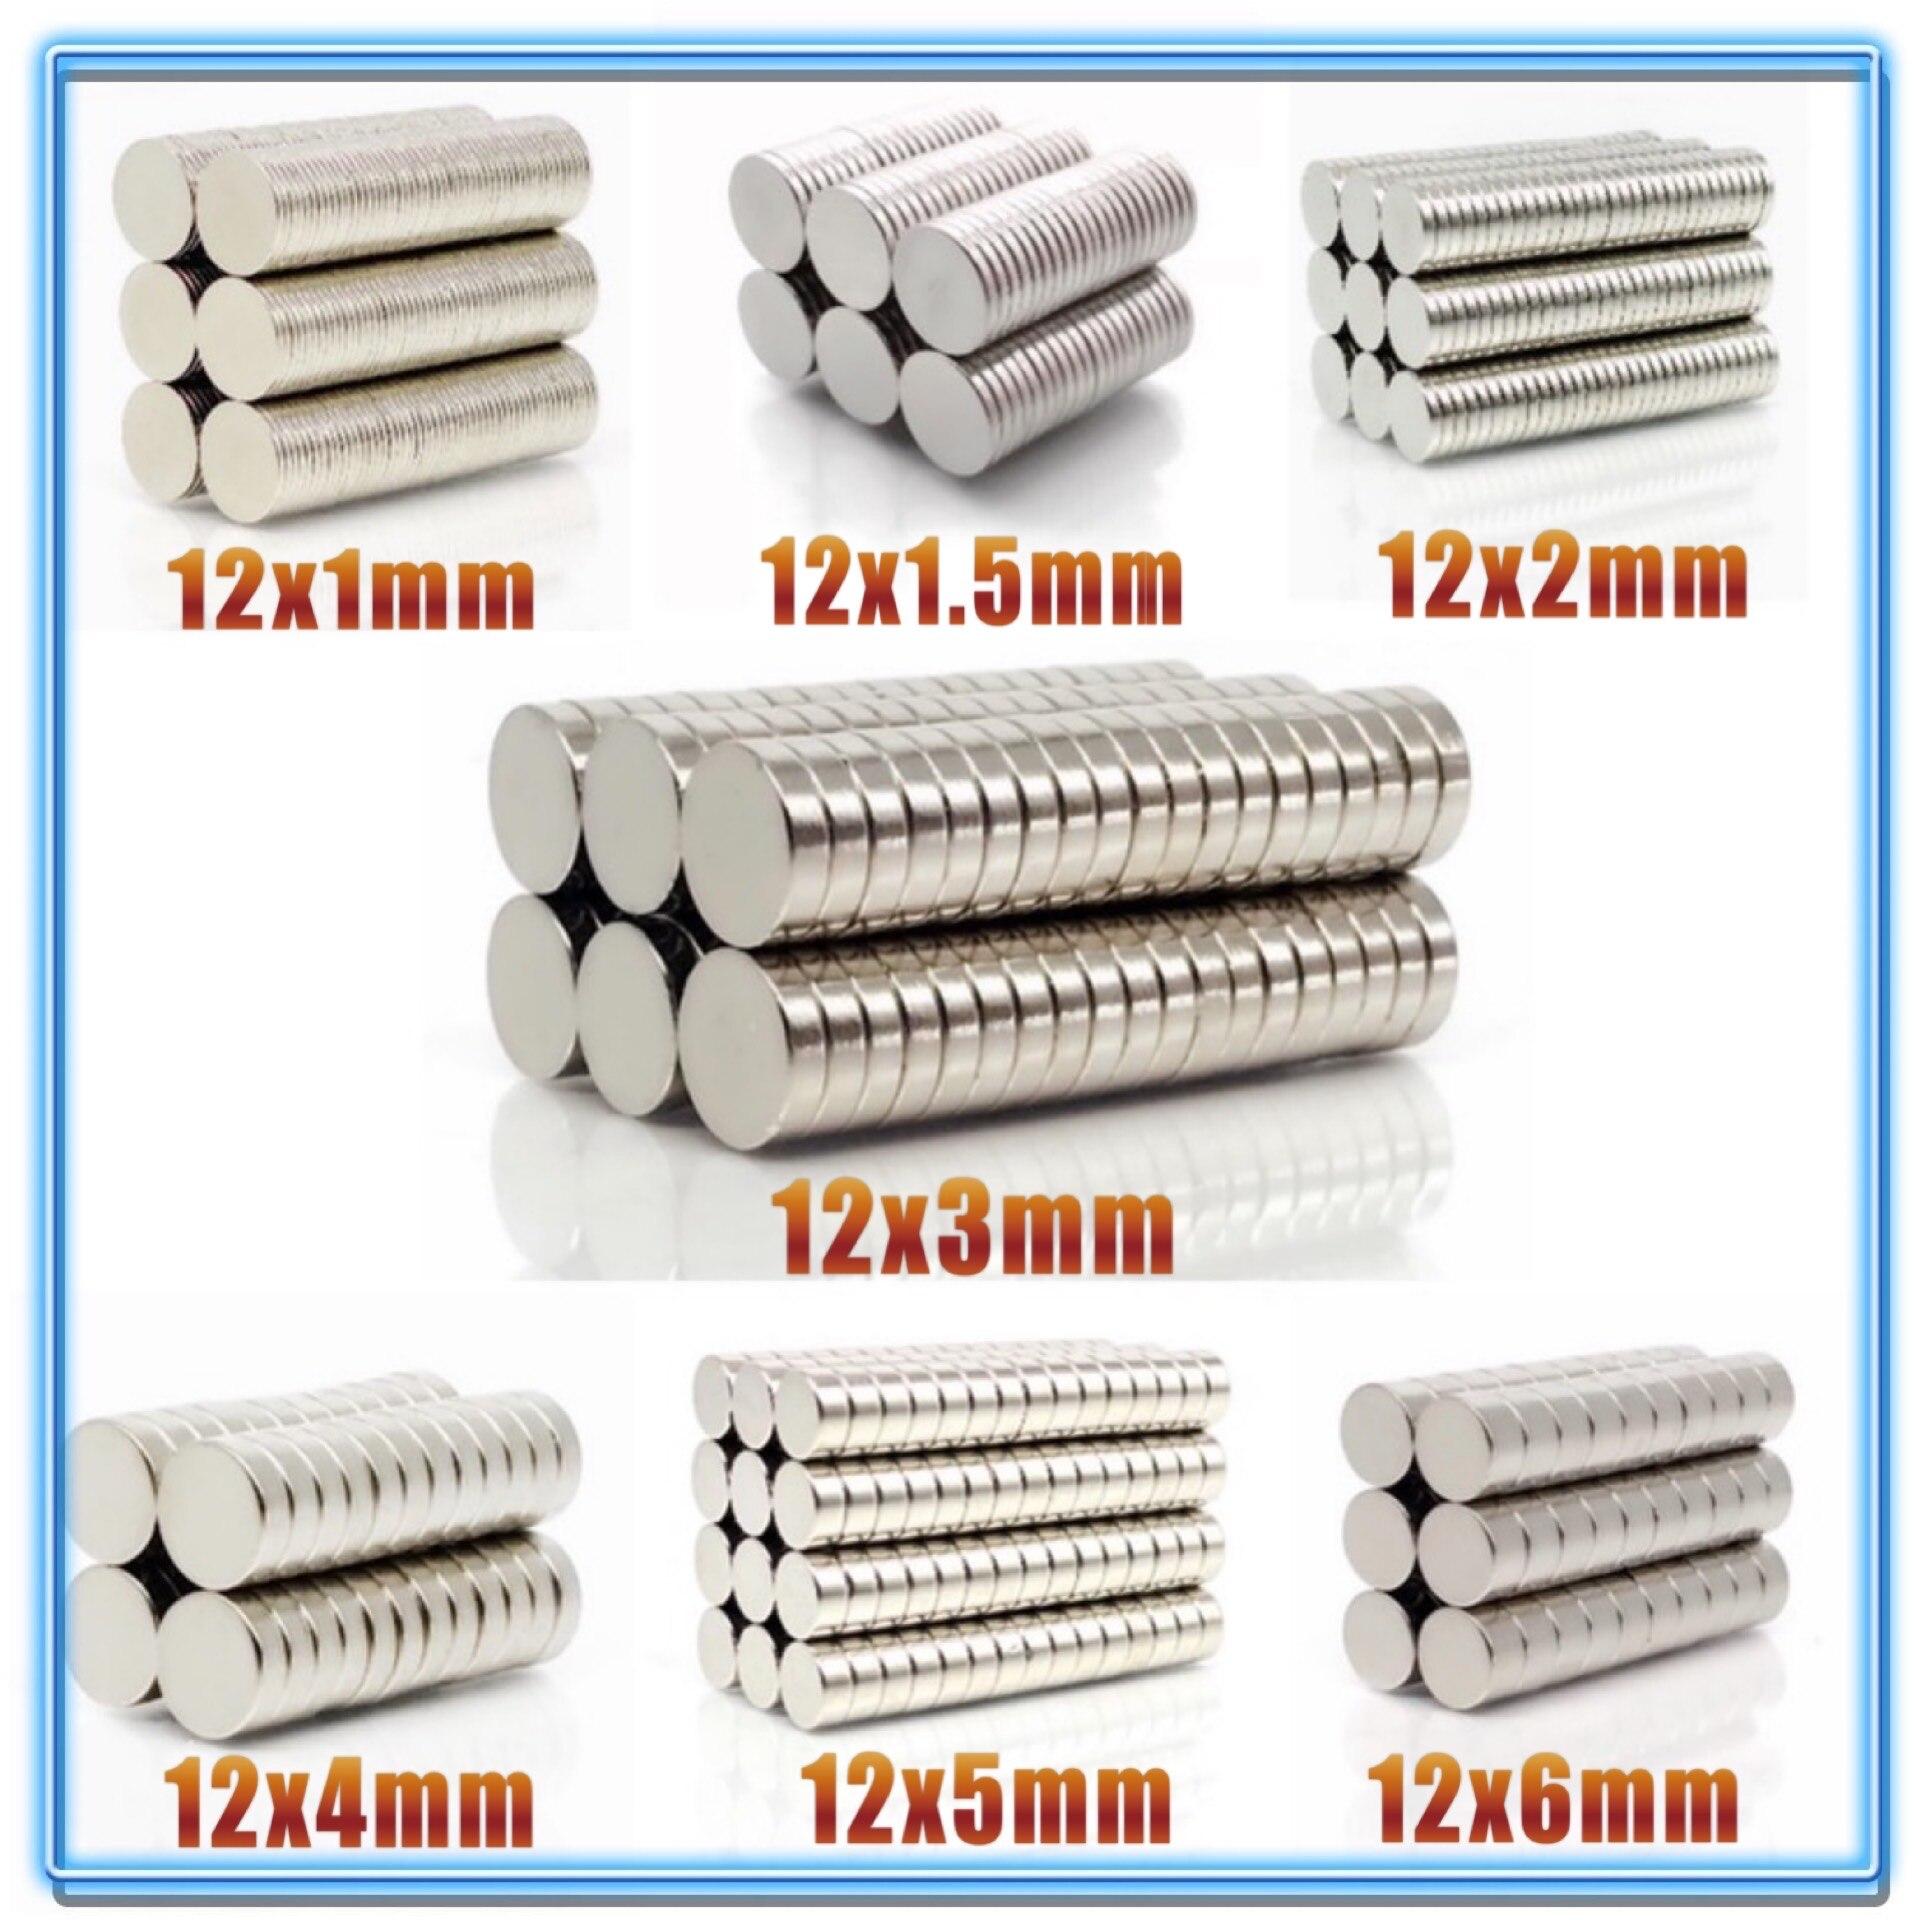 10-~-500pcs-n35-magnete-rotondo-12x1-12x15-12x2-12x3-12x4-12x5-12x6-neodimio-magnete-permanente-al-neodimio-super-forte-potenti-magneti